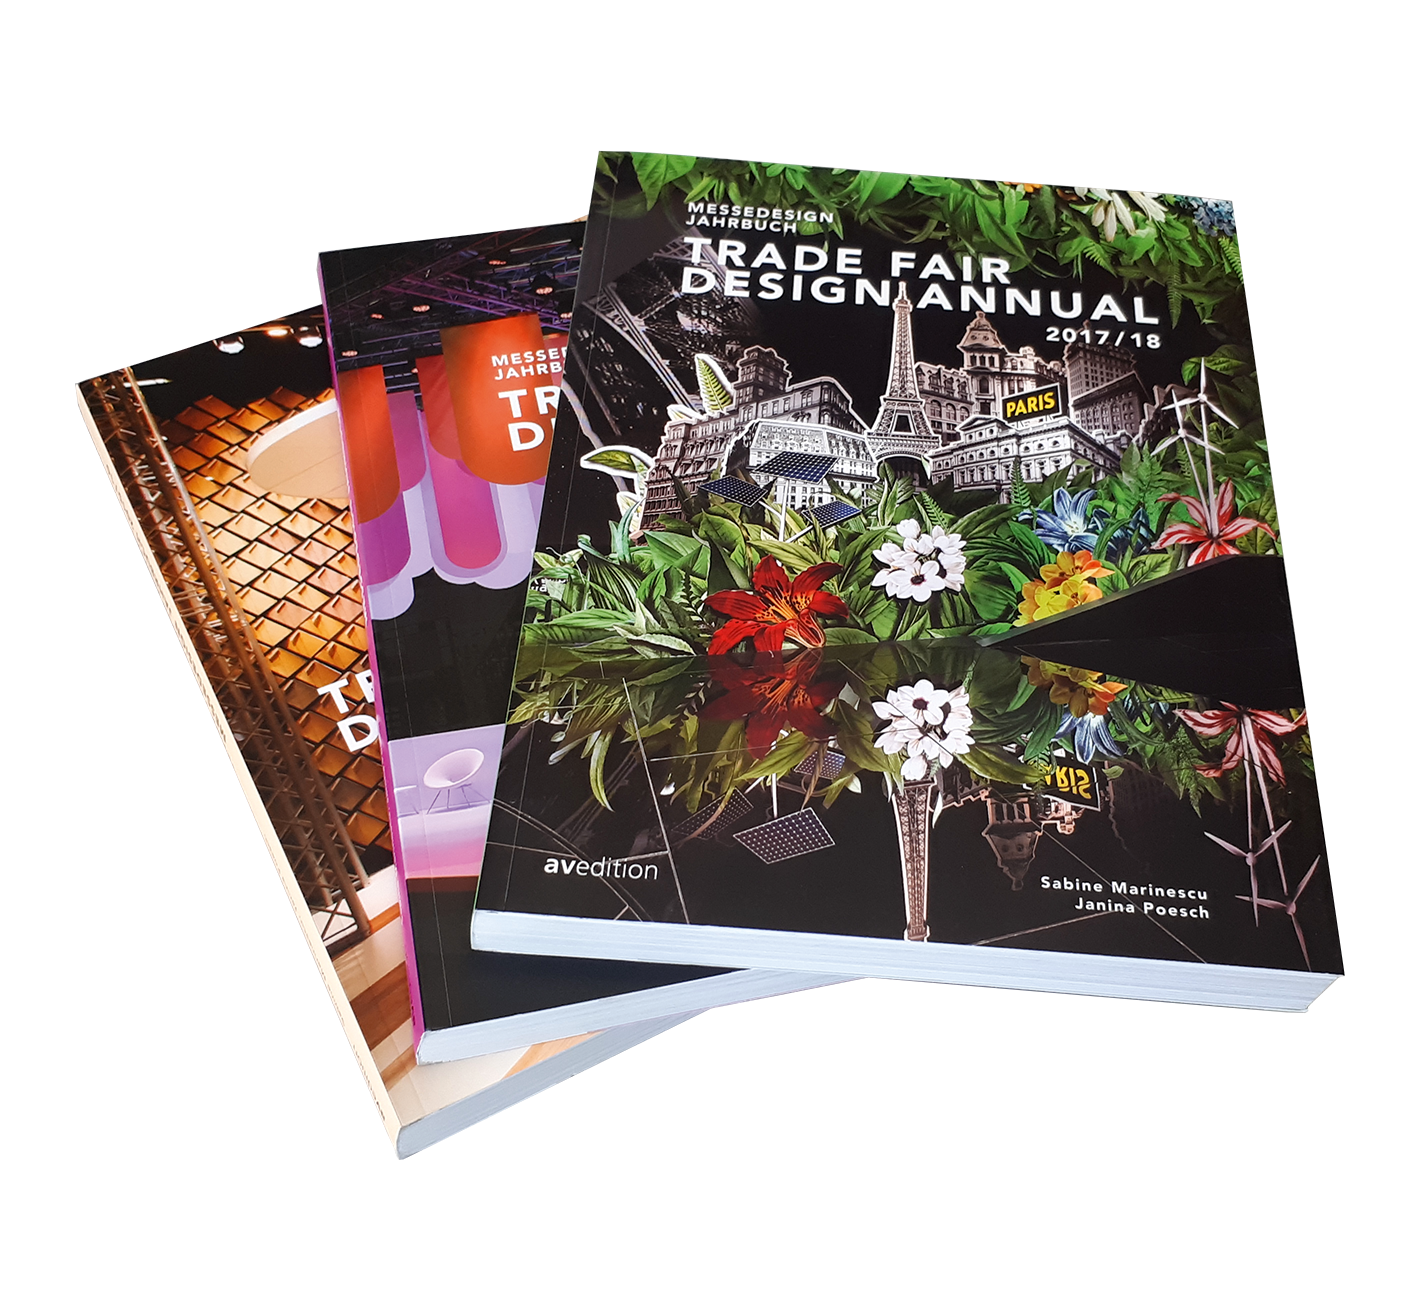 Bundle Trade Fair Design Annual  2017/18, 2016/17, 2015/16